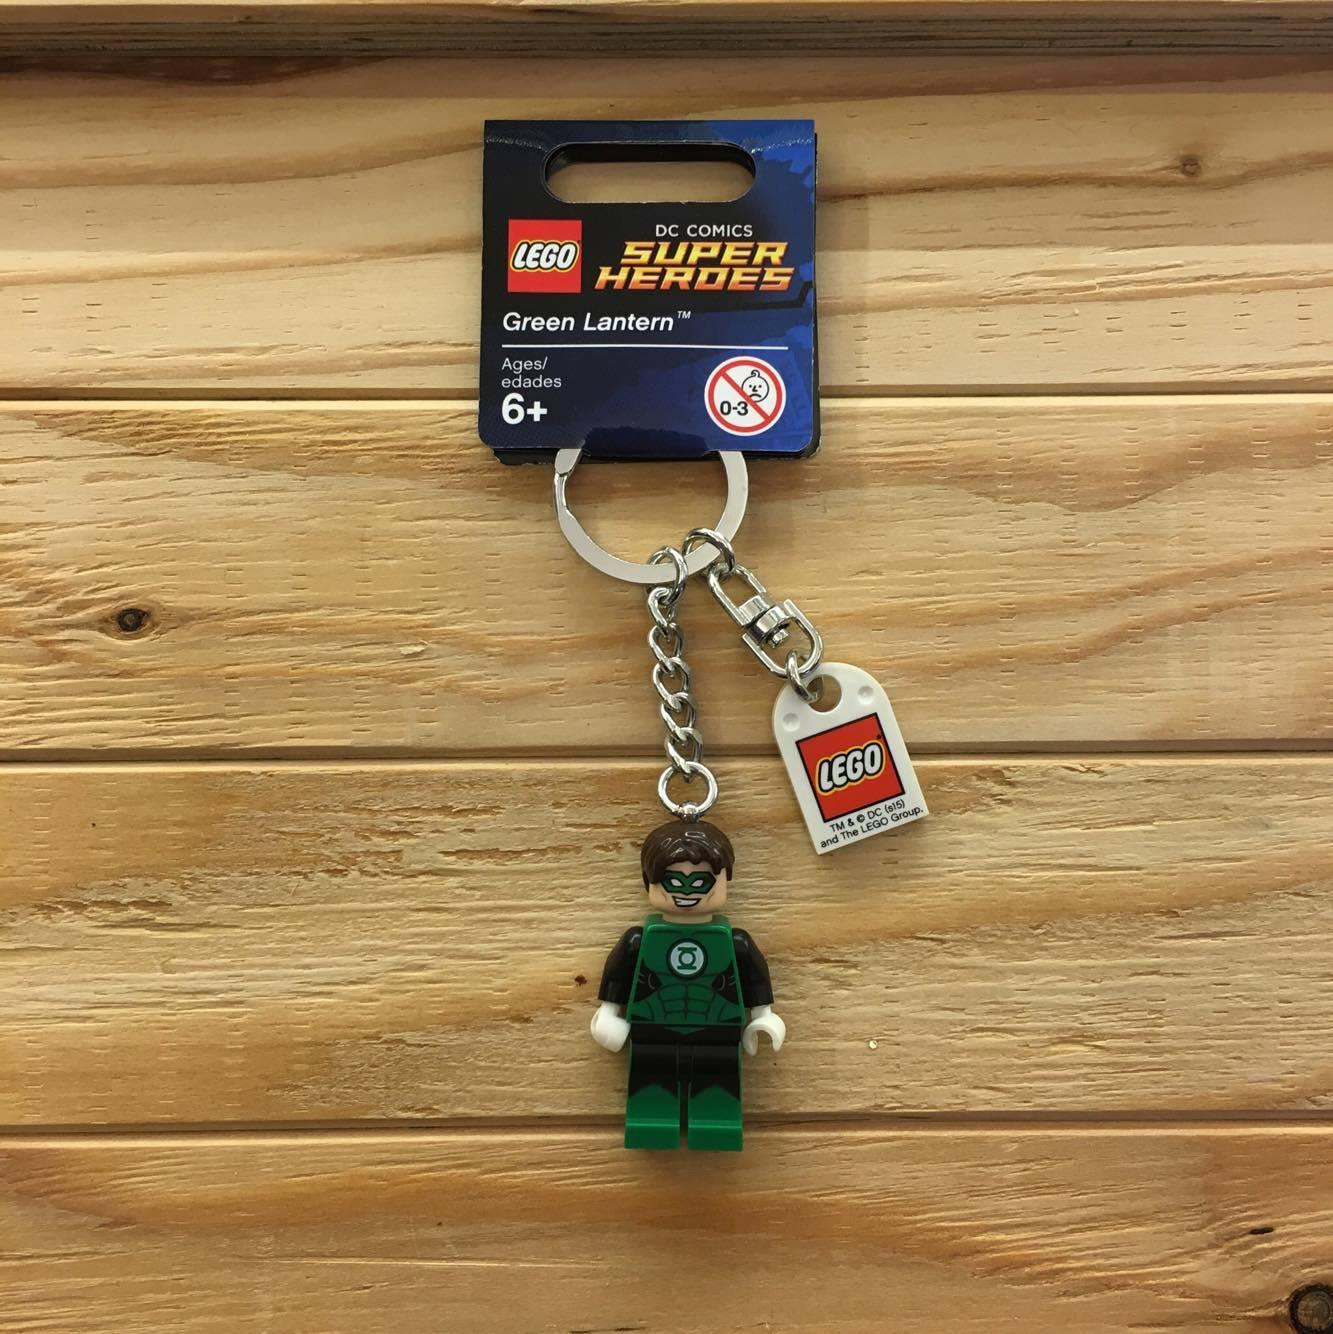 BEETLE LEGO SUPER HEROES GREEN LANTERN 綠燈俠 樂高 積木 鑰匙圈 玩具 0